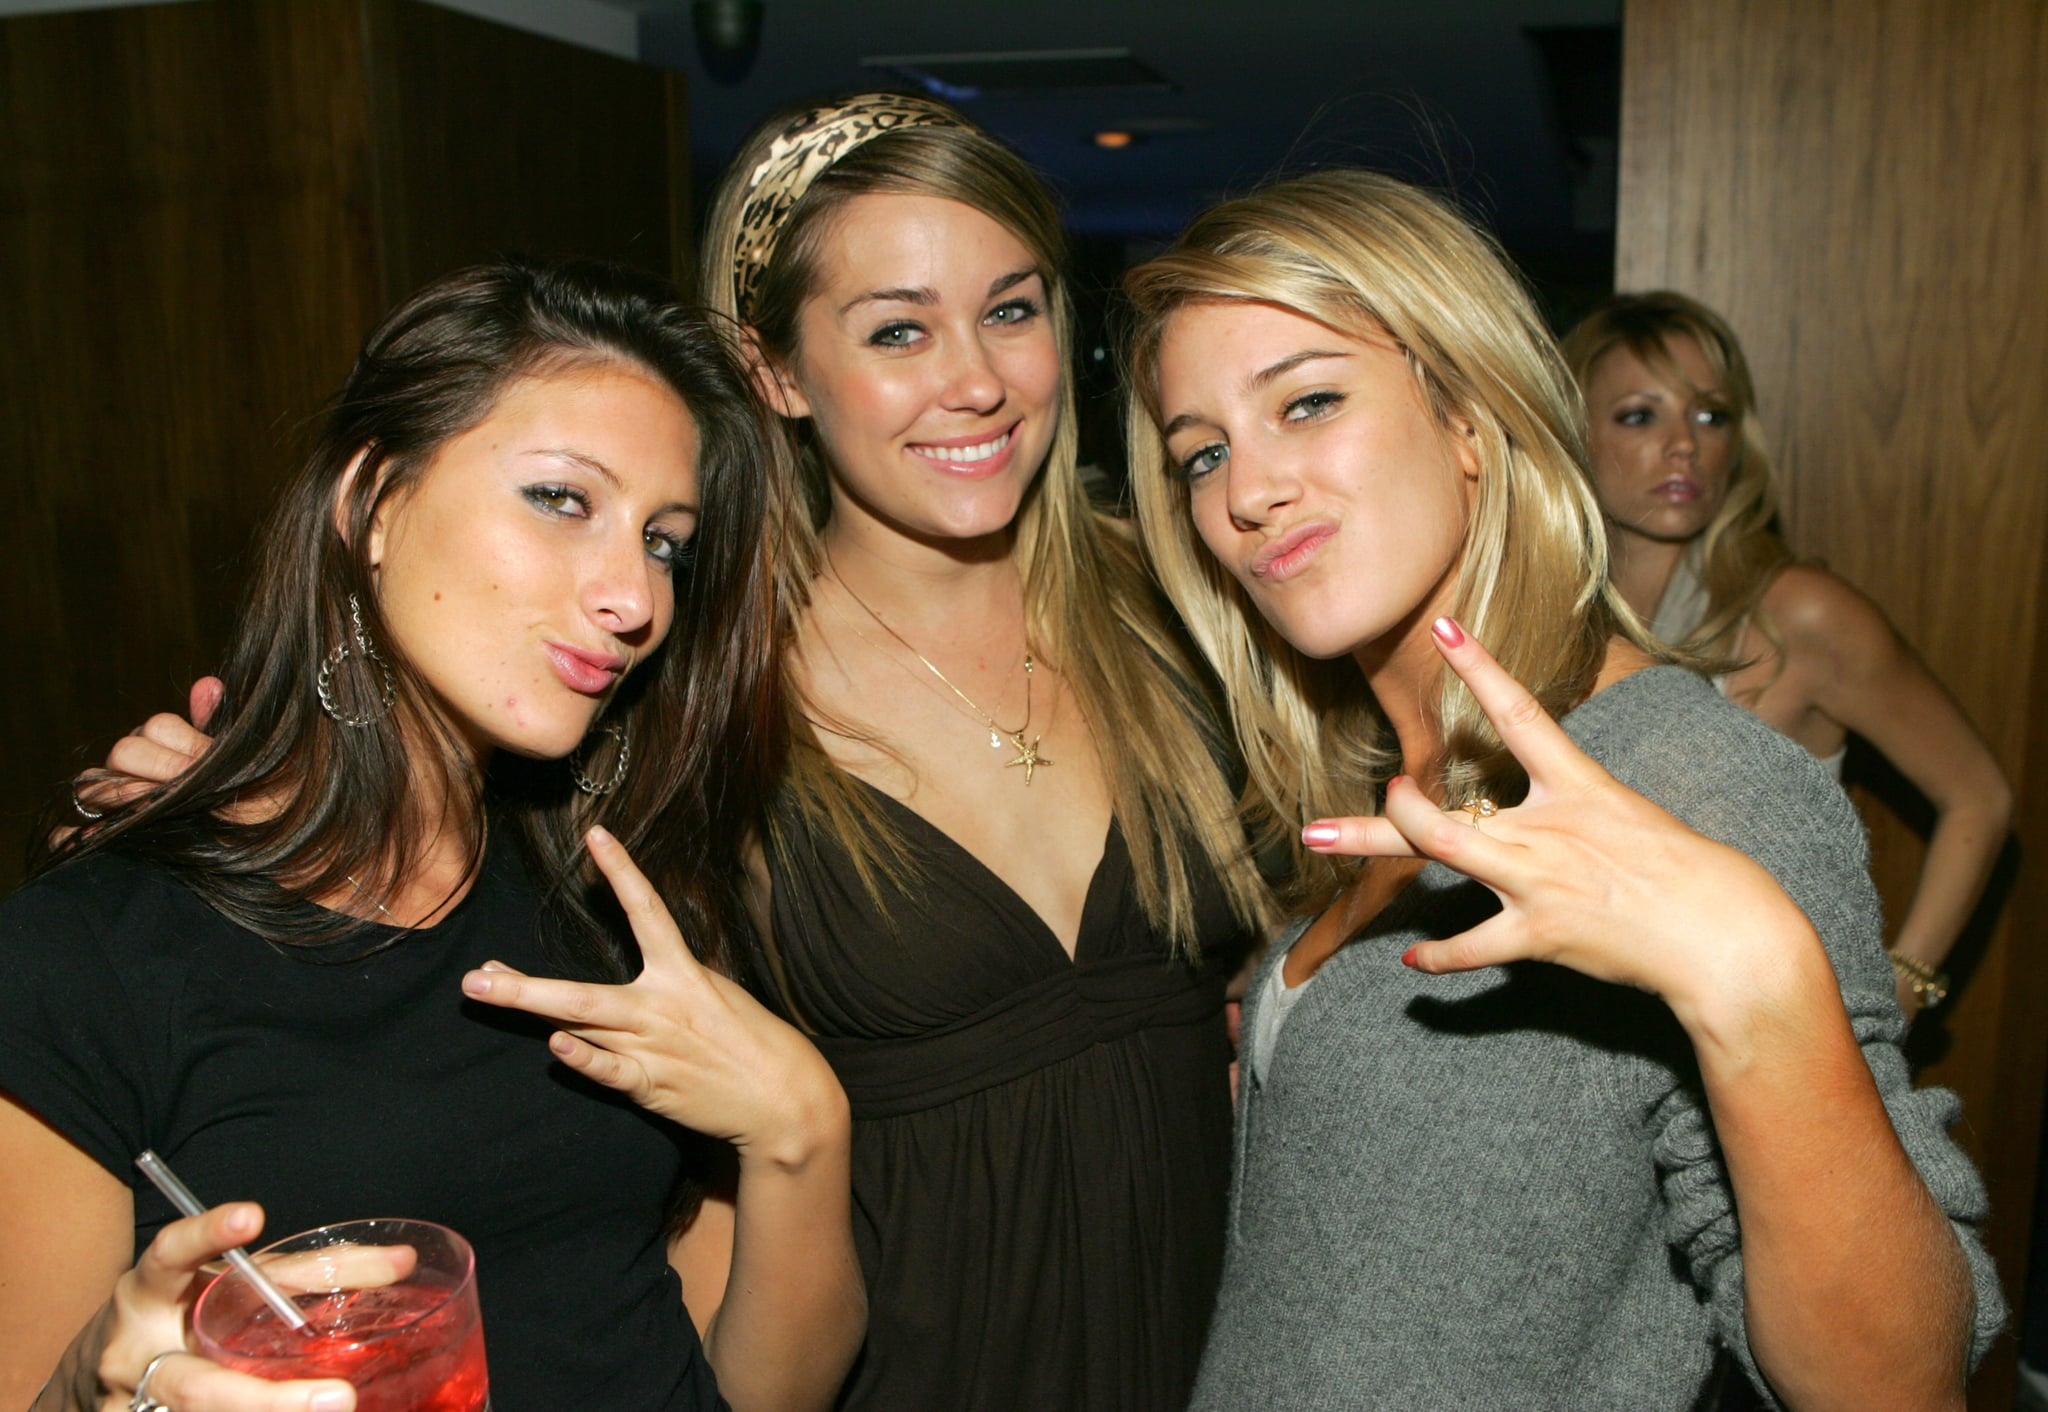 Jen Bunney and Heidi Montag had fun with Lauren Conrad in LA in October 2006.